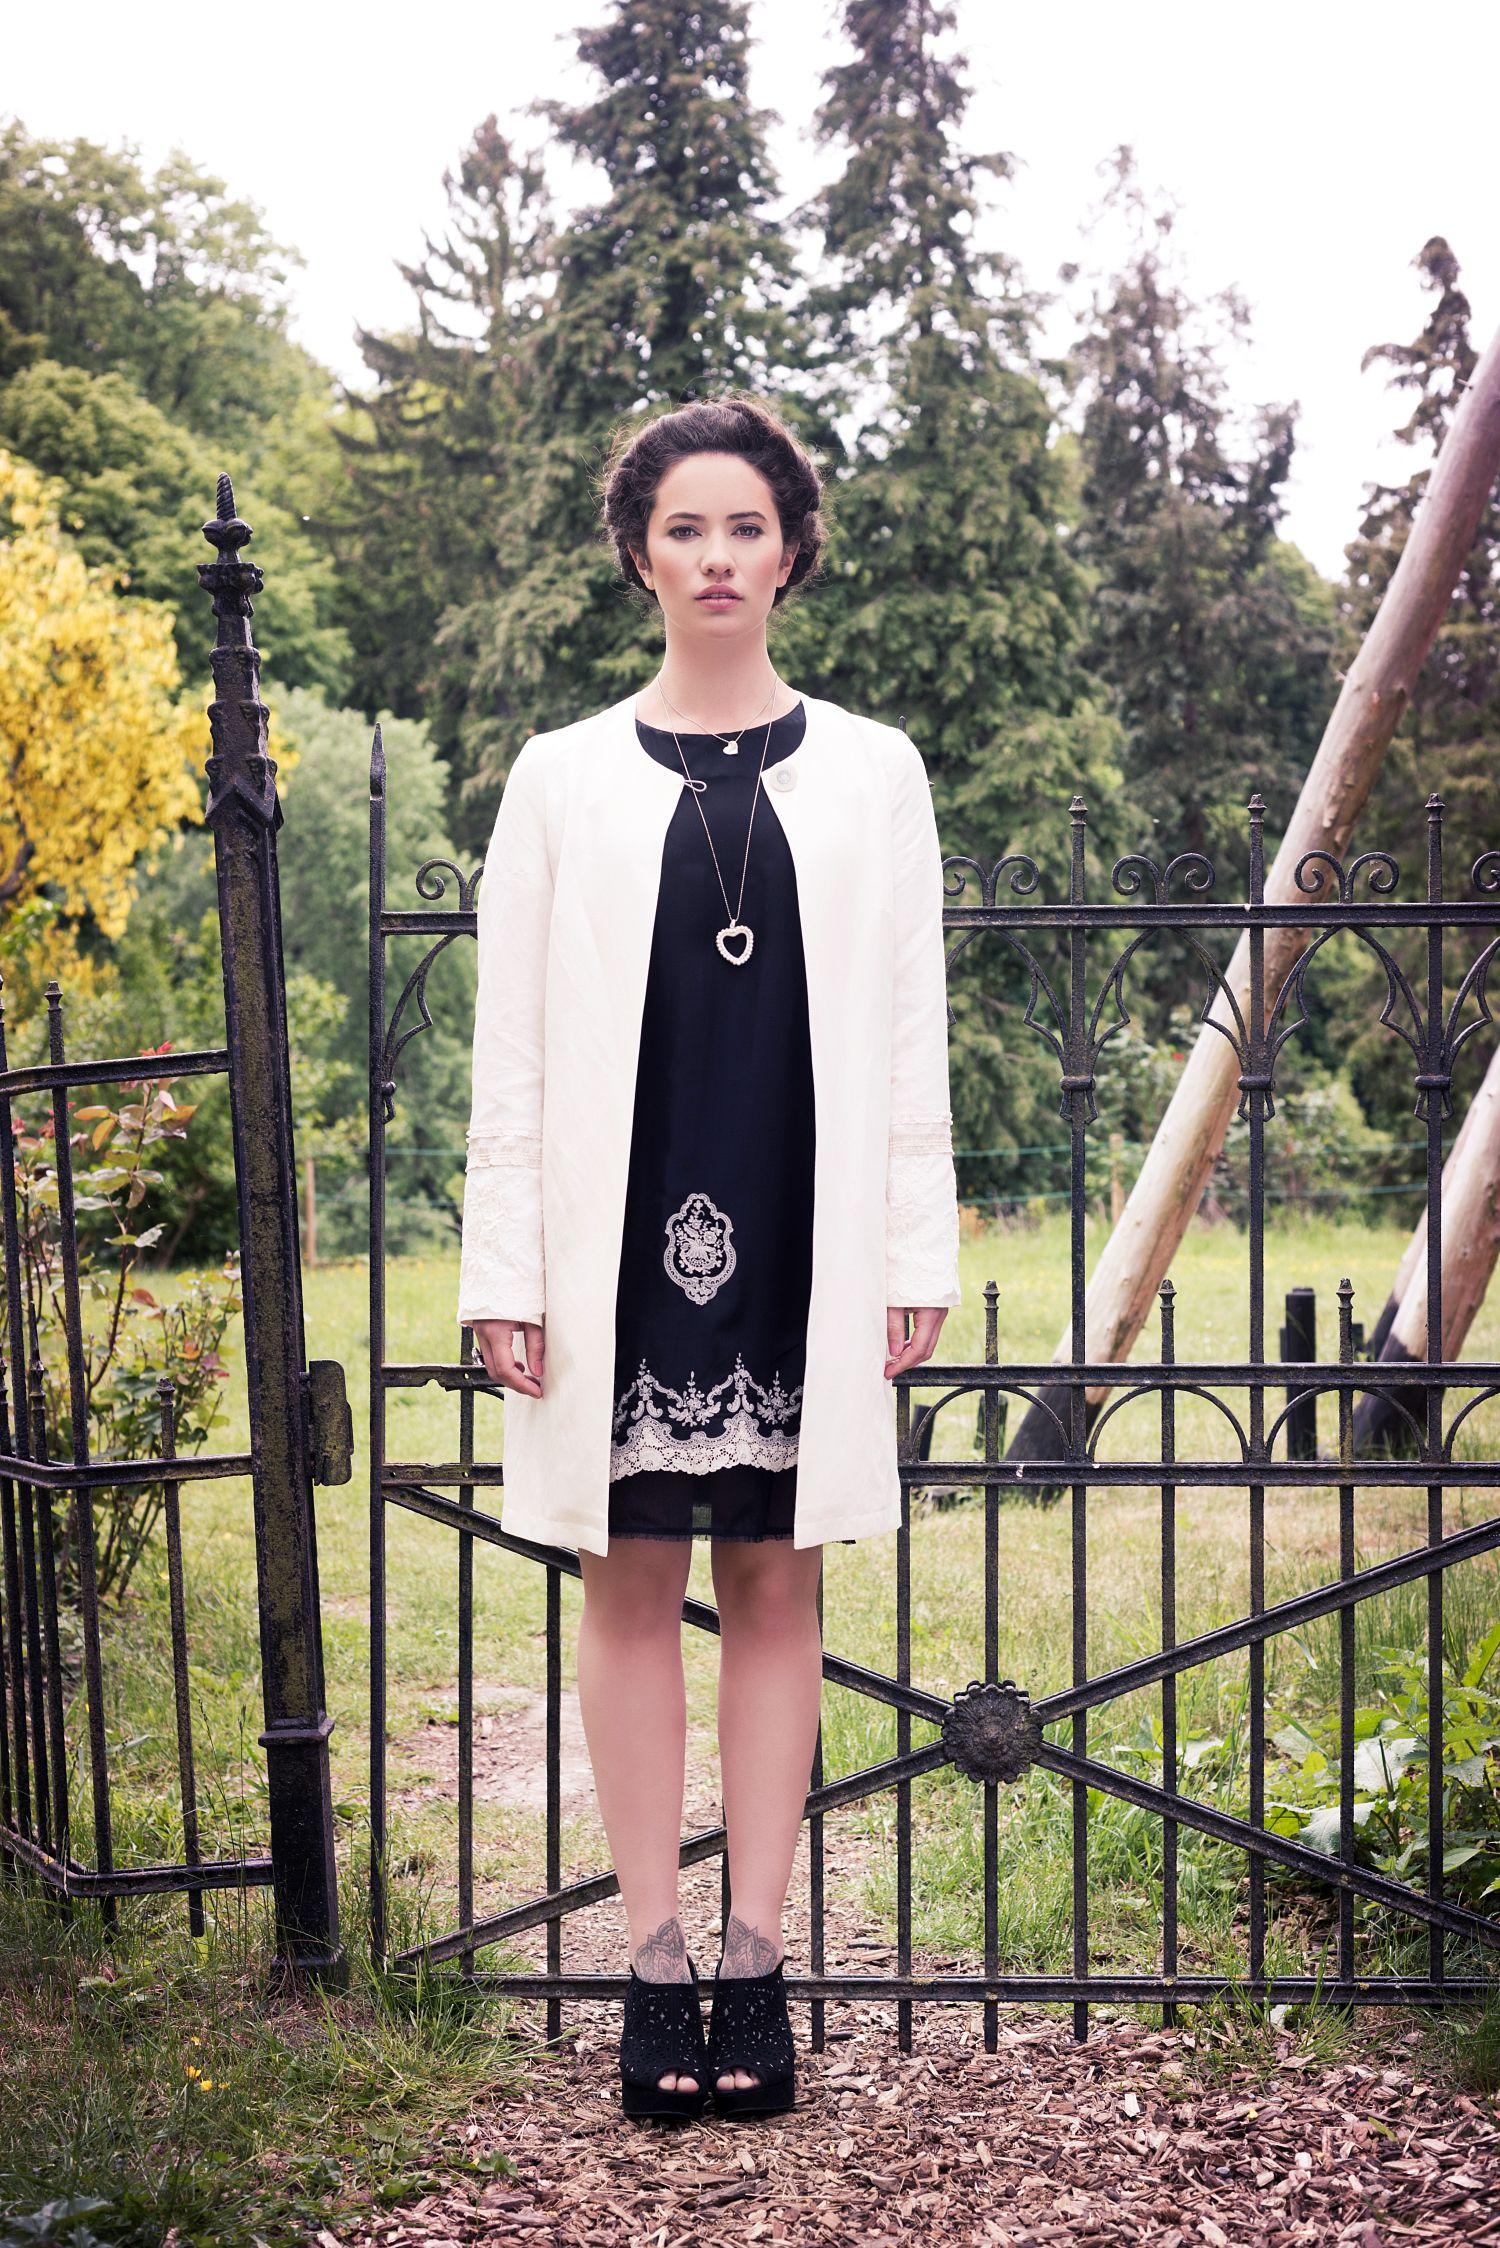 © LIEBlingsSTÜKKE by Martina Wodke   model  Thijsiena  hair & make-up   Sabine Bierschenk